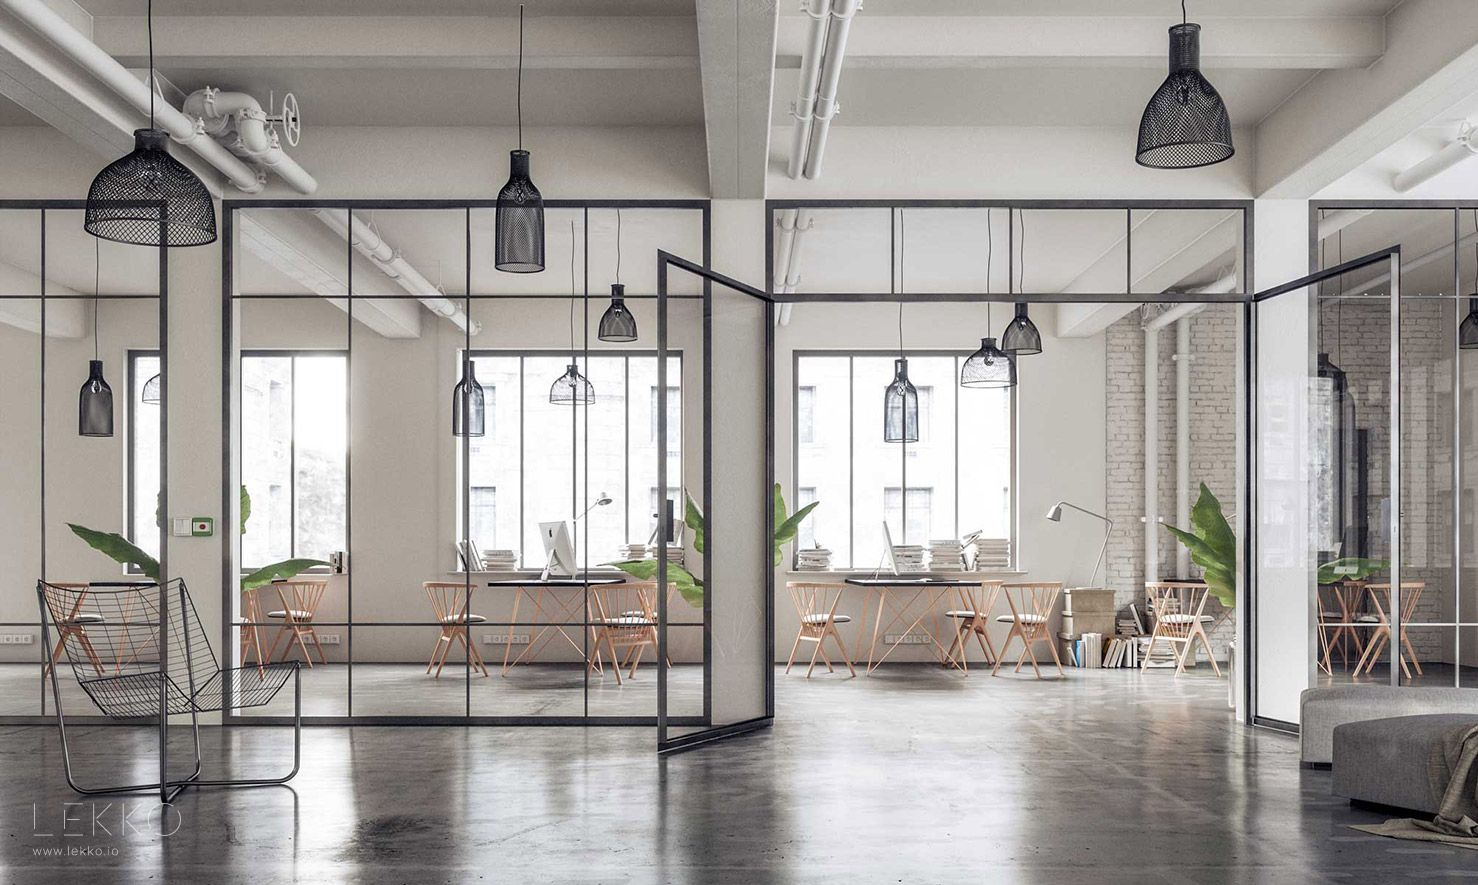 Sciana Miedzy Salonem A Kuchnia Space Interiors Home Industrial Office